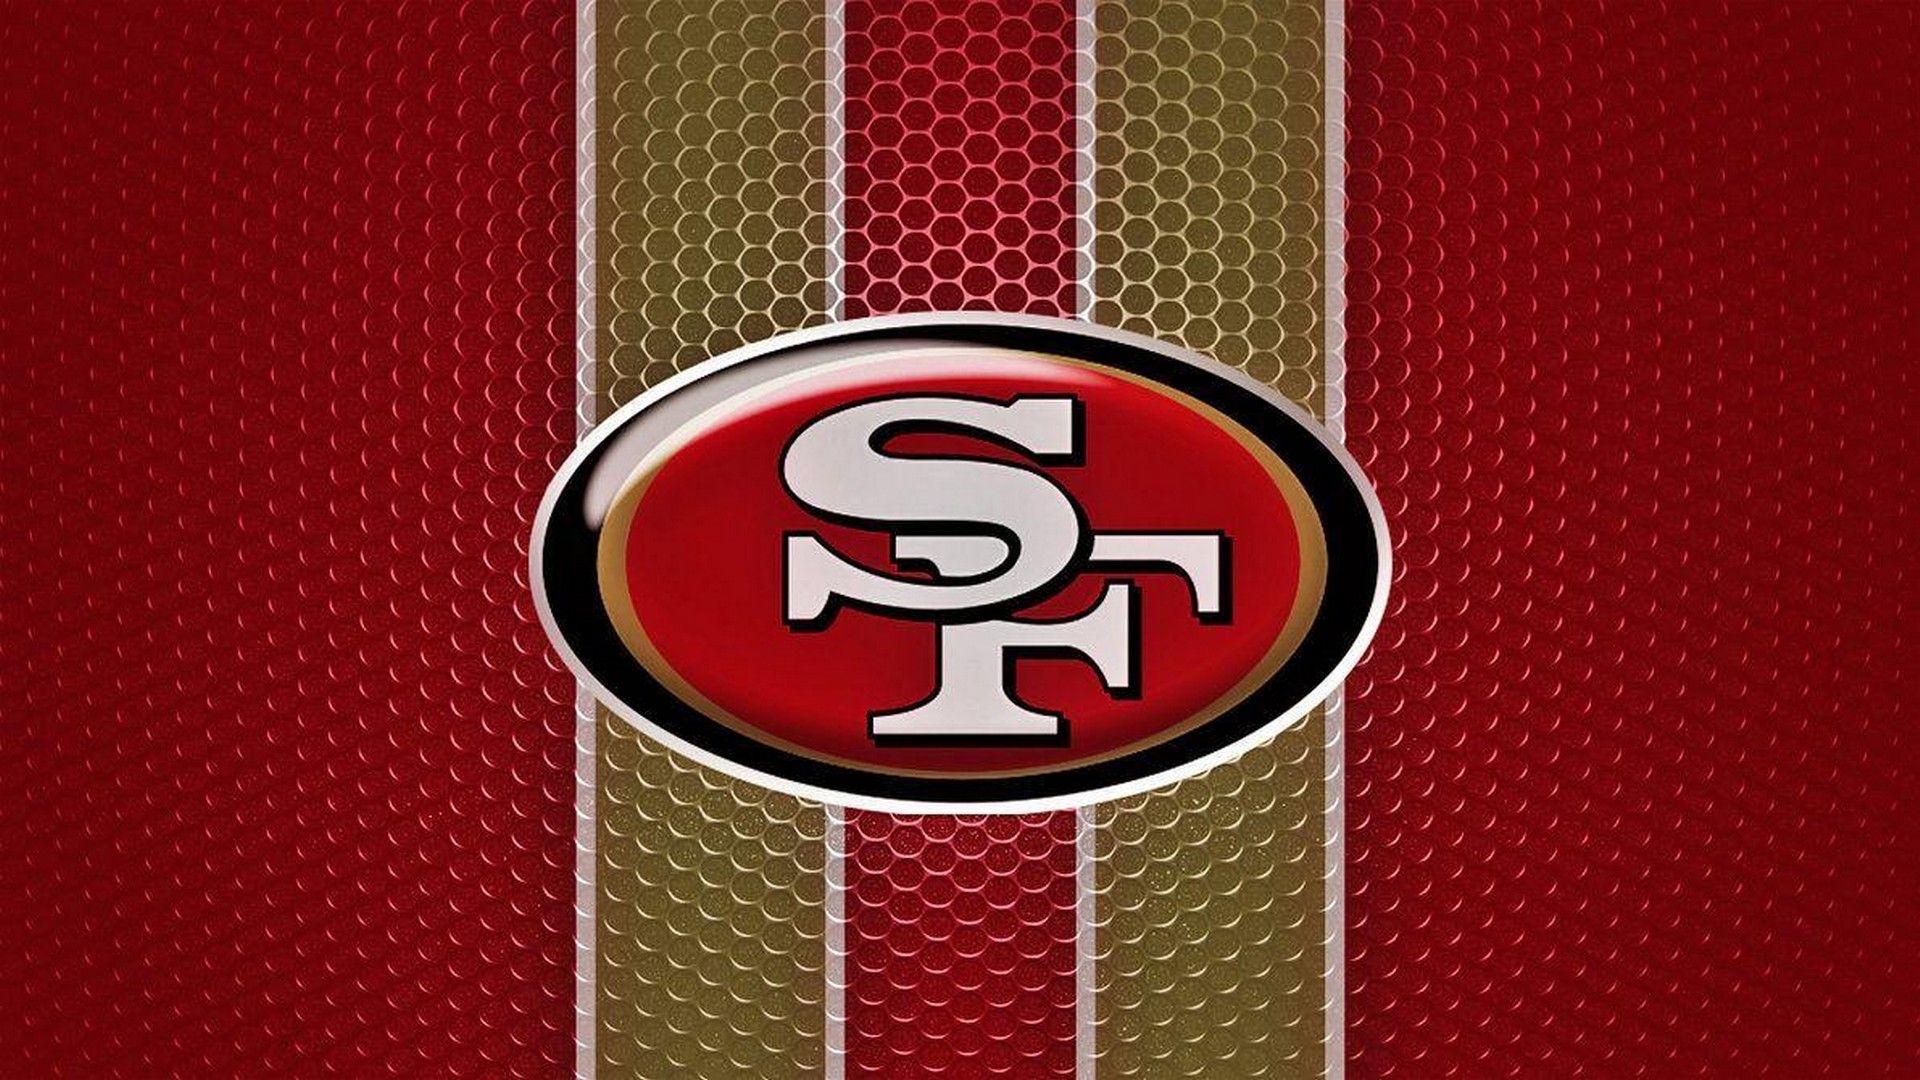 San Francisco 49ers Hd Wallpapers 2021 Nfl Football Wallpapers Nfl Football Wallpaper San Francisco 49ers Football Wallpaper